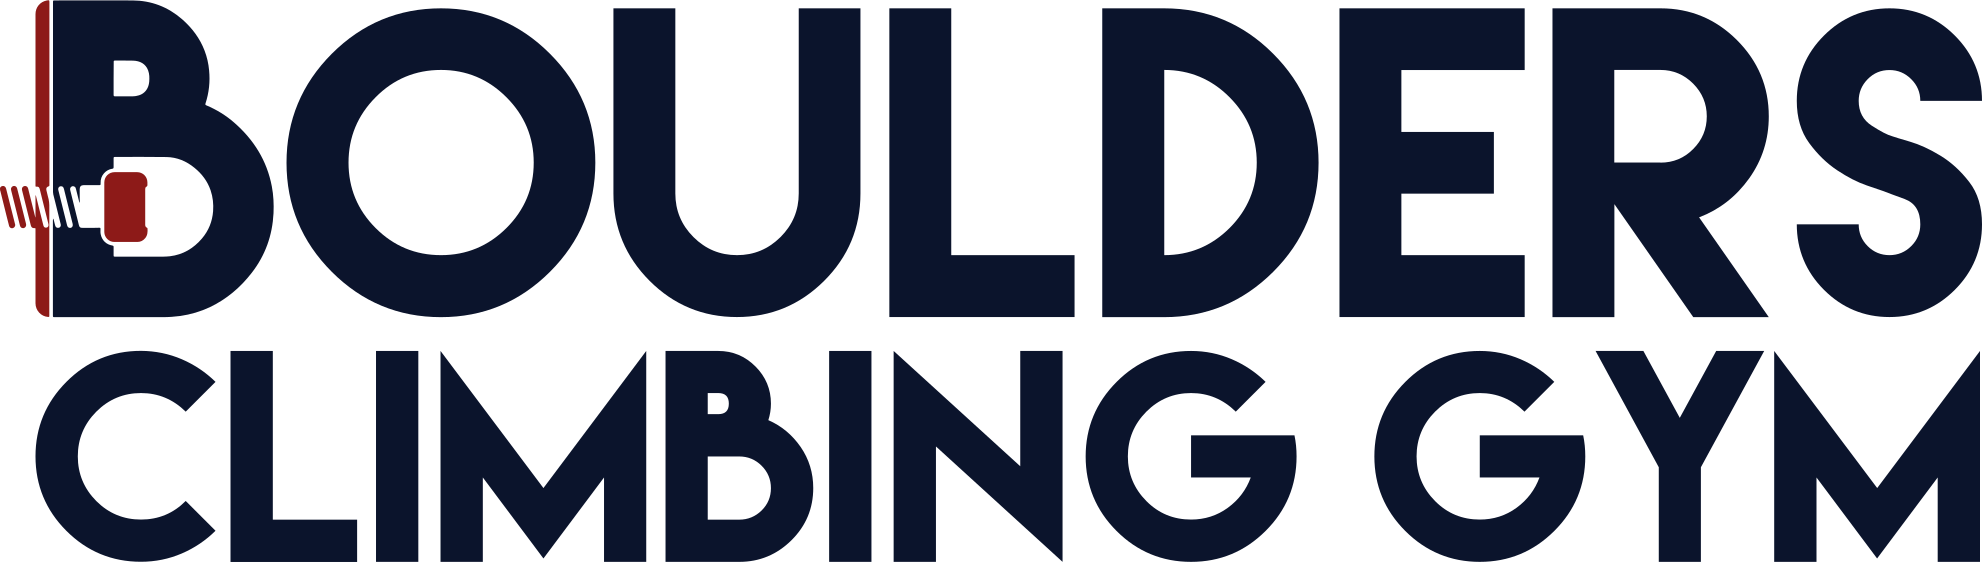 BouldersClimbingGym_Primary.png